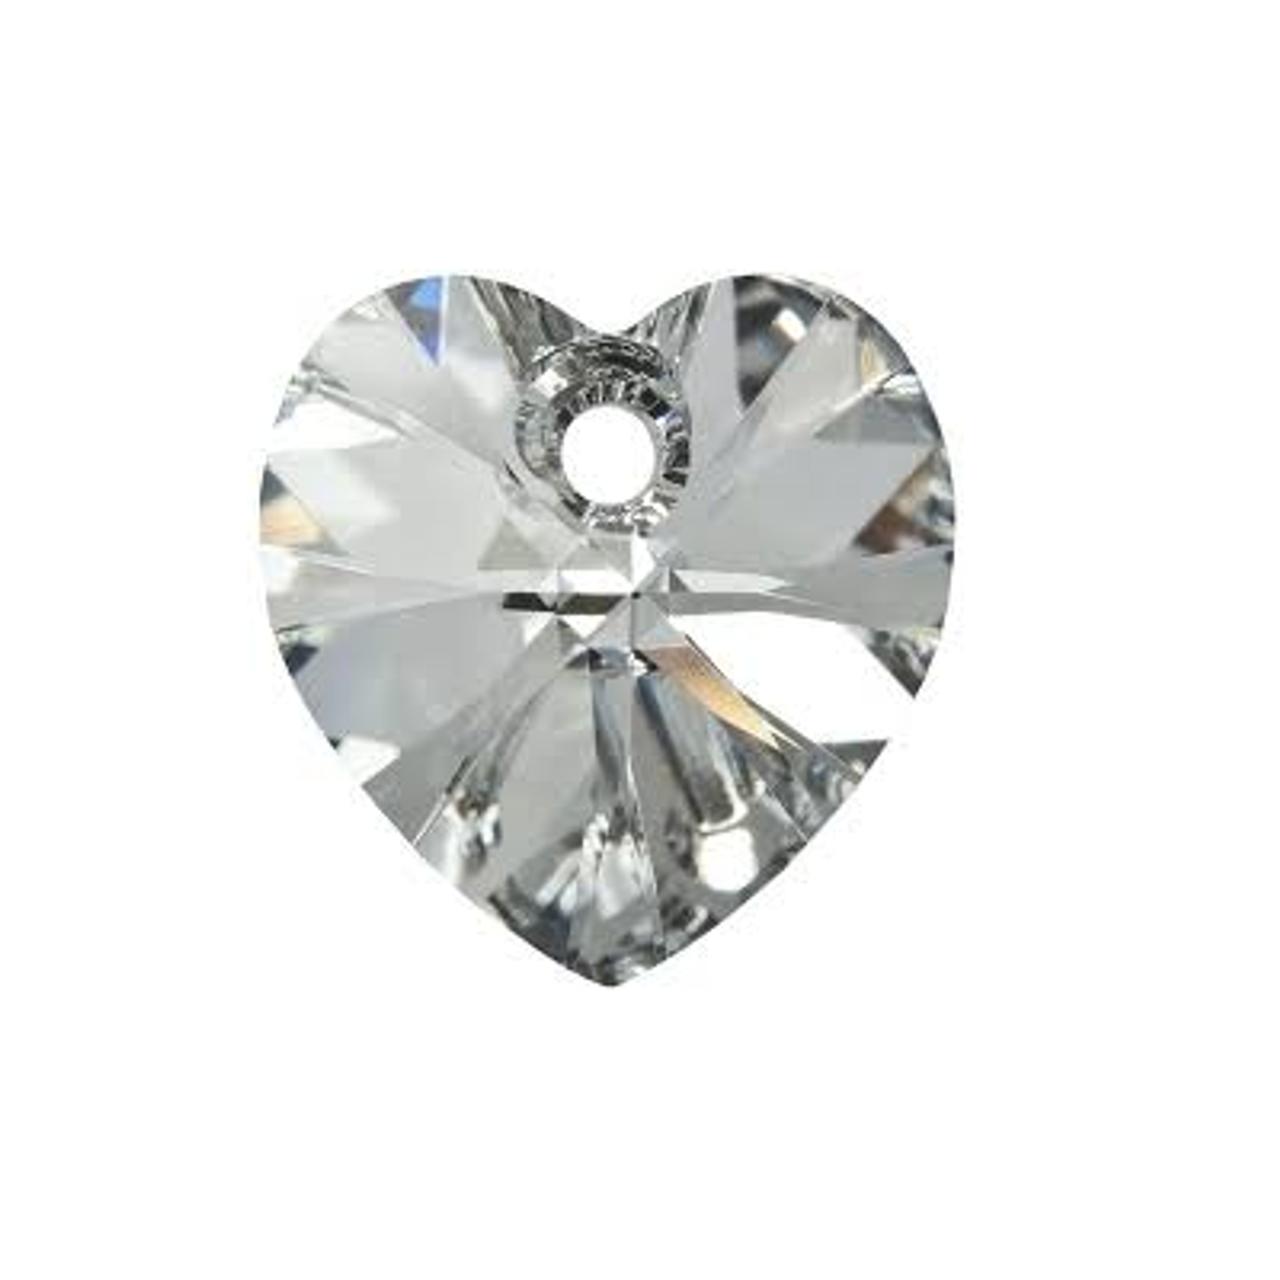 549f83cf2c0e7 Swarovski 6228 10mm Xilion Heart Pendants Blue Zircon AB (18 pieces)